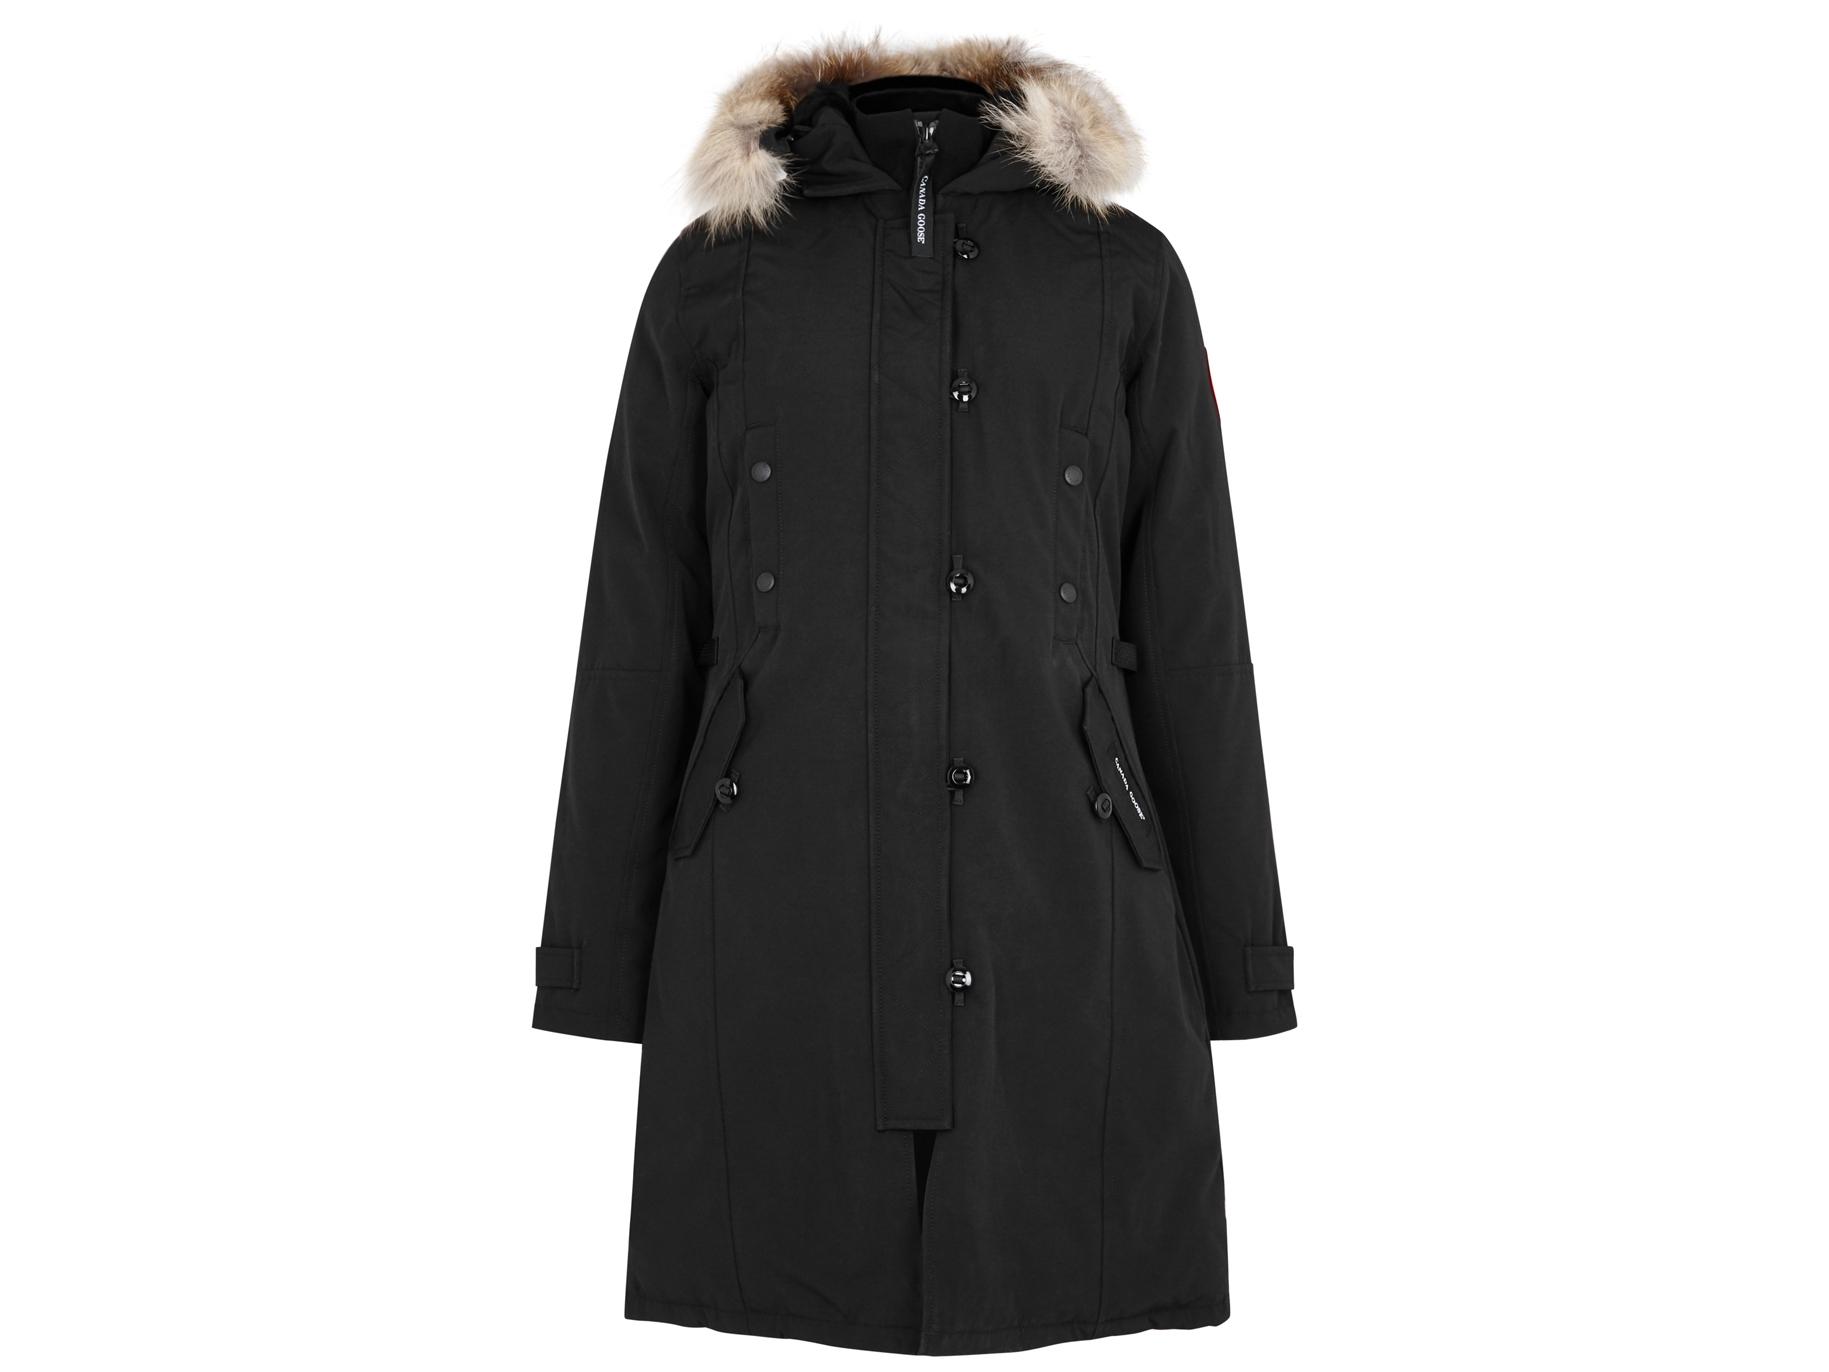 Canada Goose Kensington black fur-trimmed parka - Harvey Nichols b9d8aedf8f3